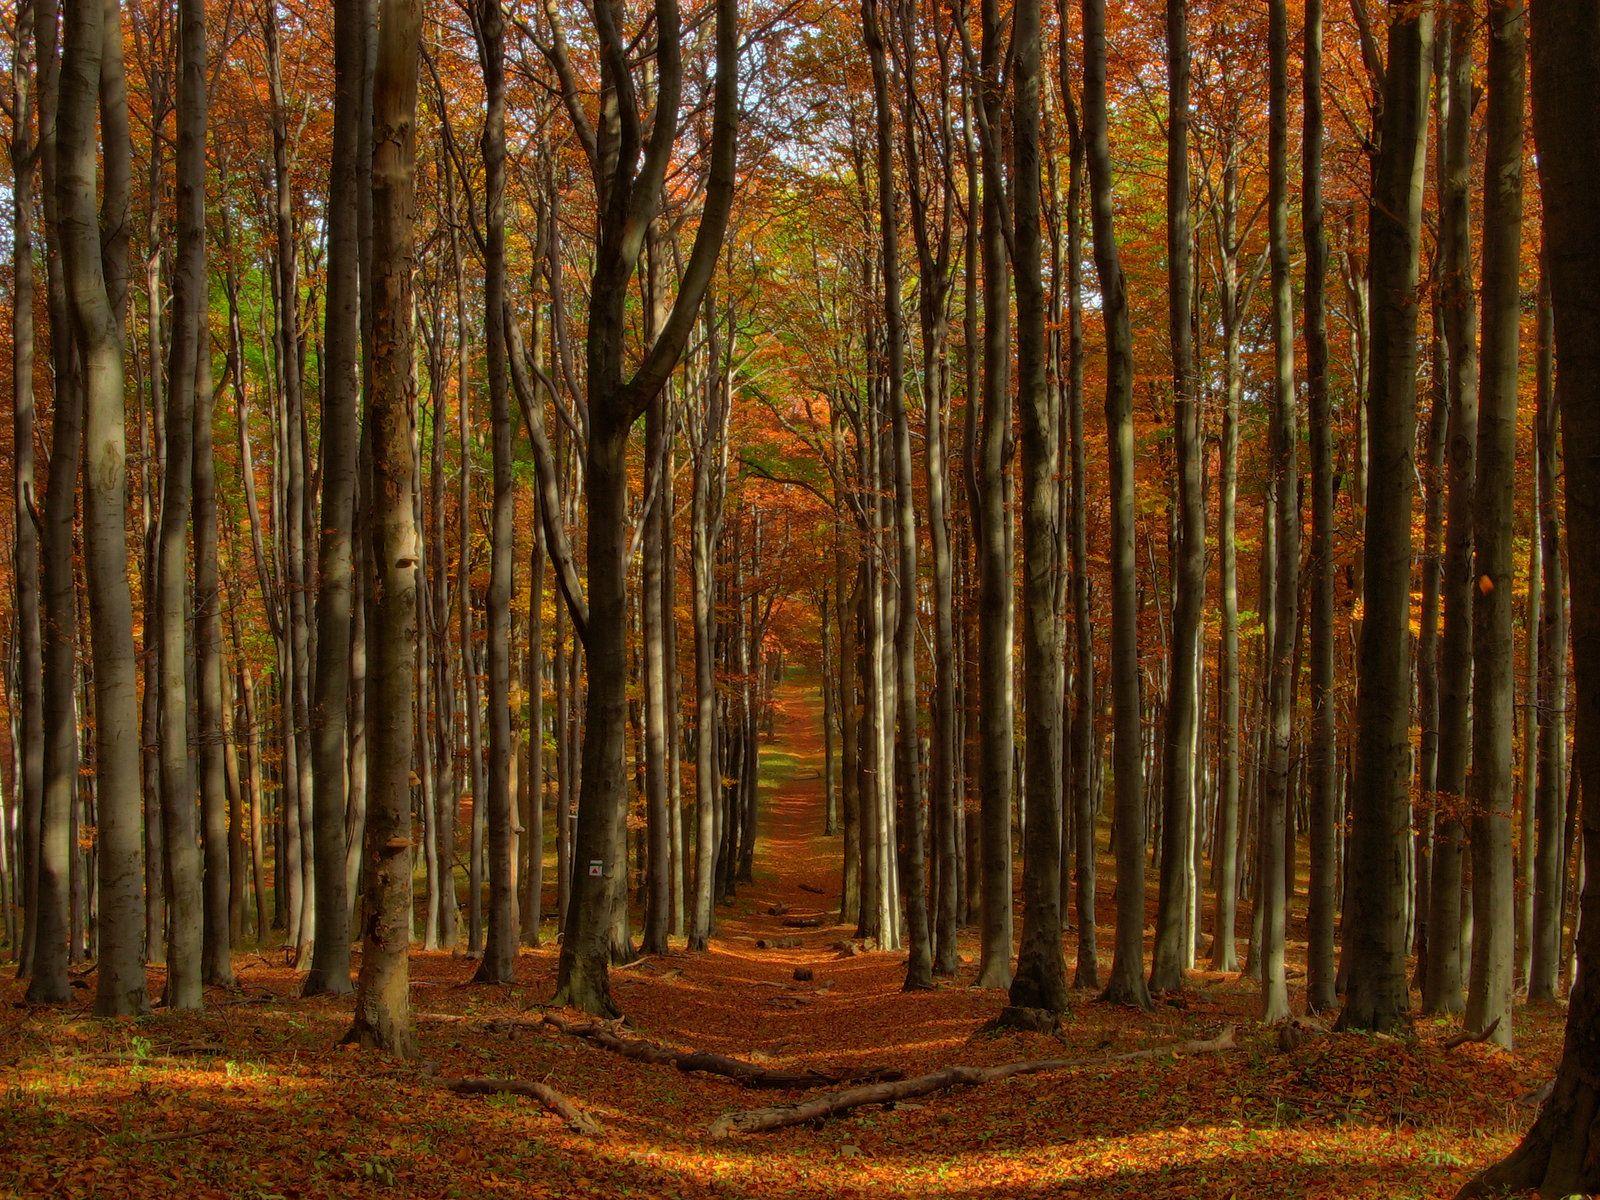 Awesome tree woods wallpaper desktop wallpaper download